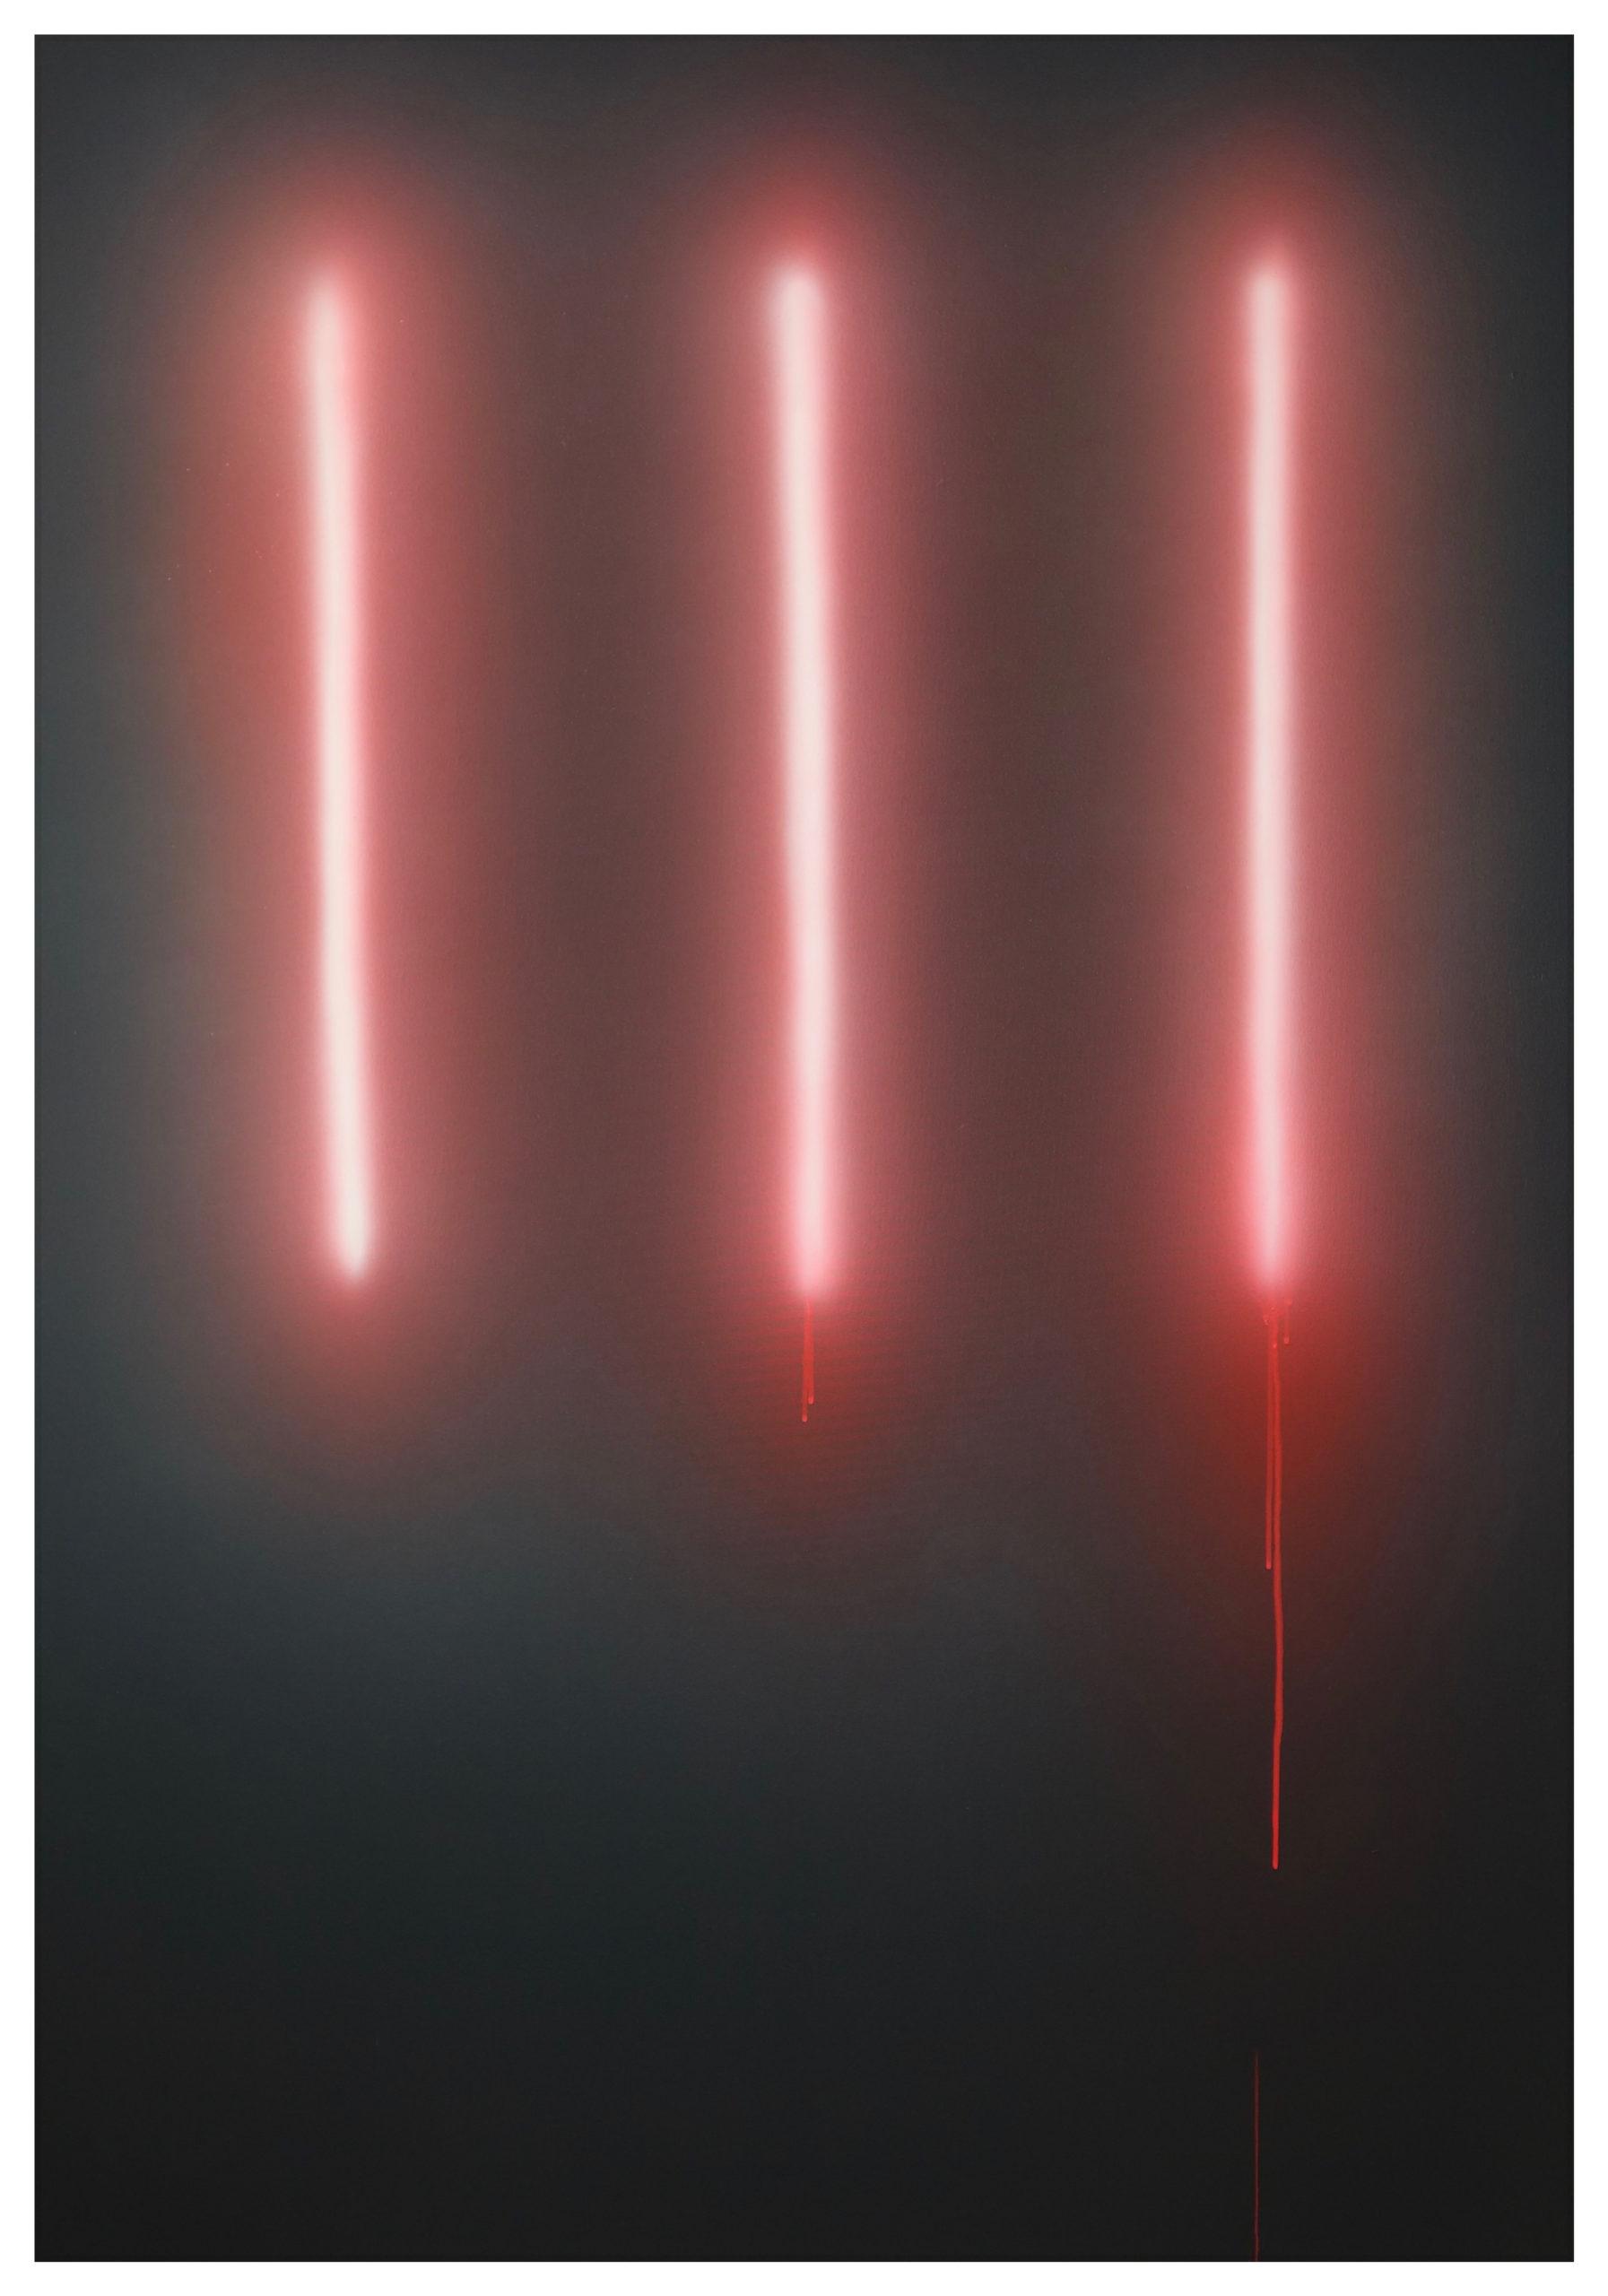 Nicolas Delprat, Dan, évolution acrylique sur toile 115 x 160 cm 2020, courtesy Nicolas Delprat